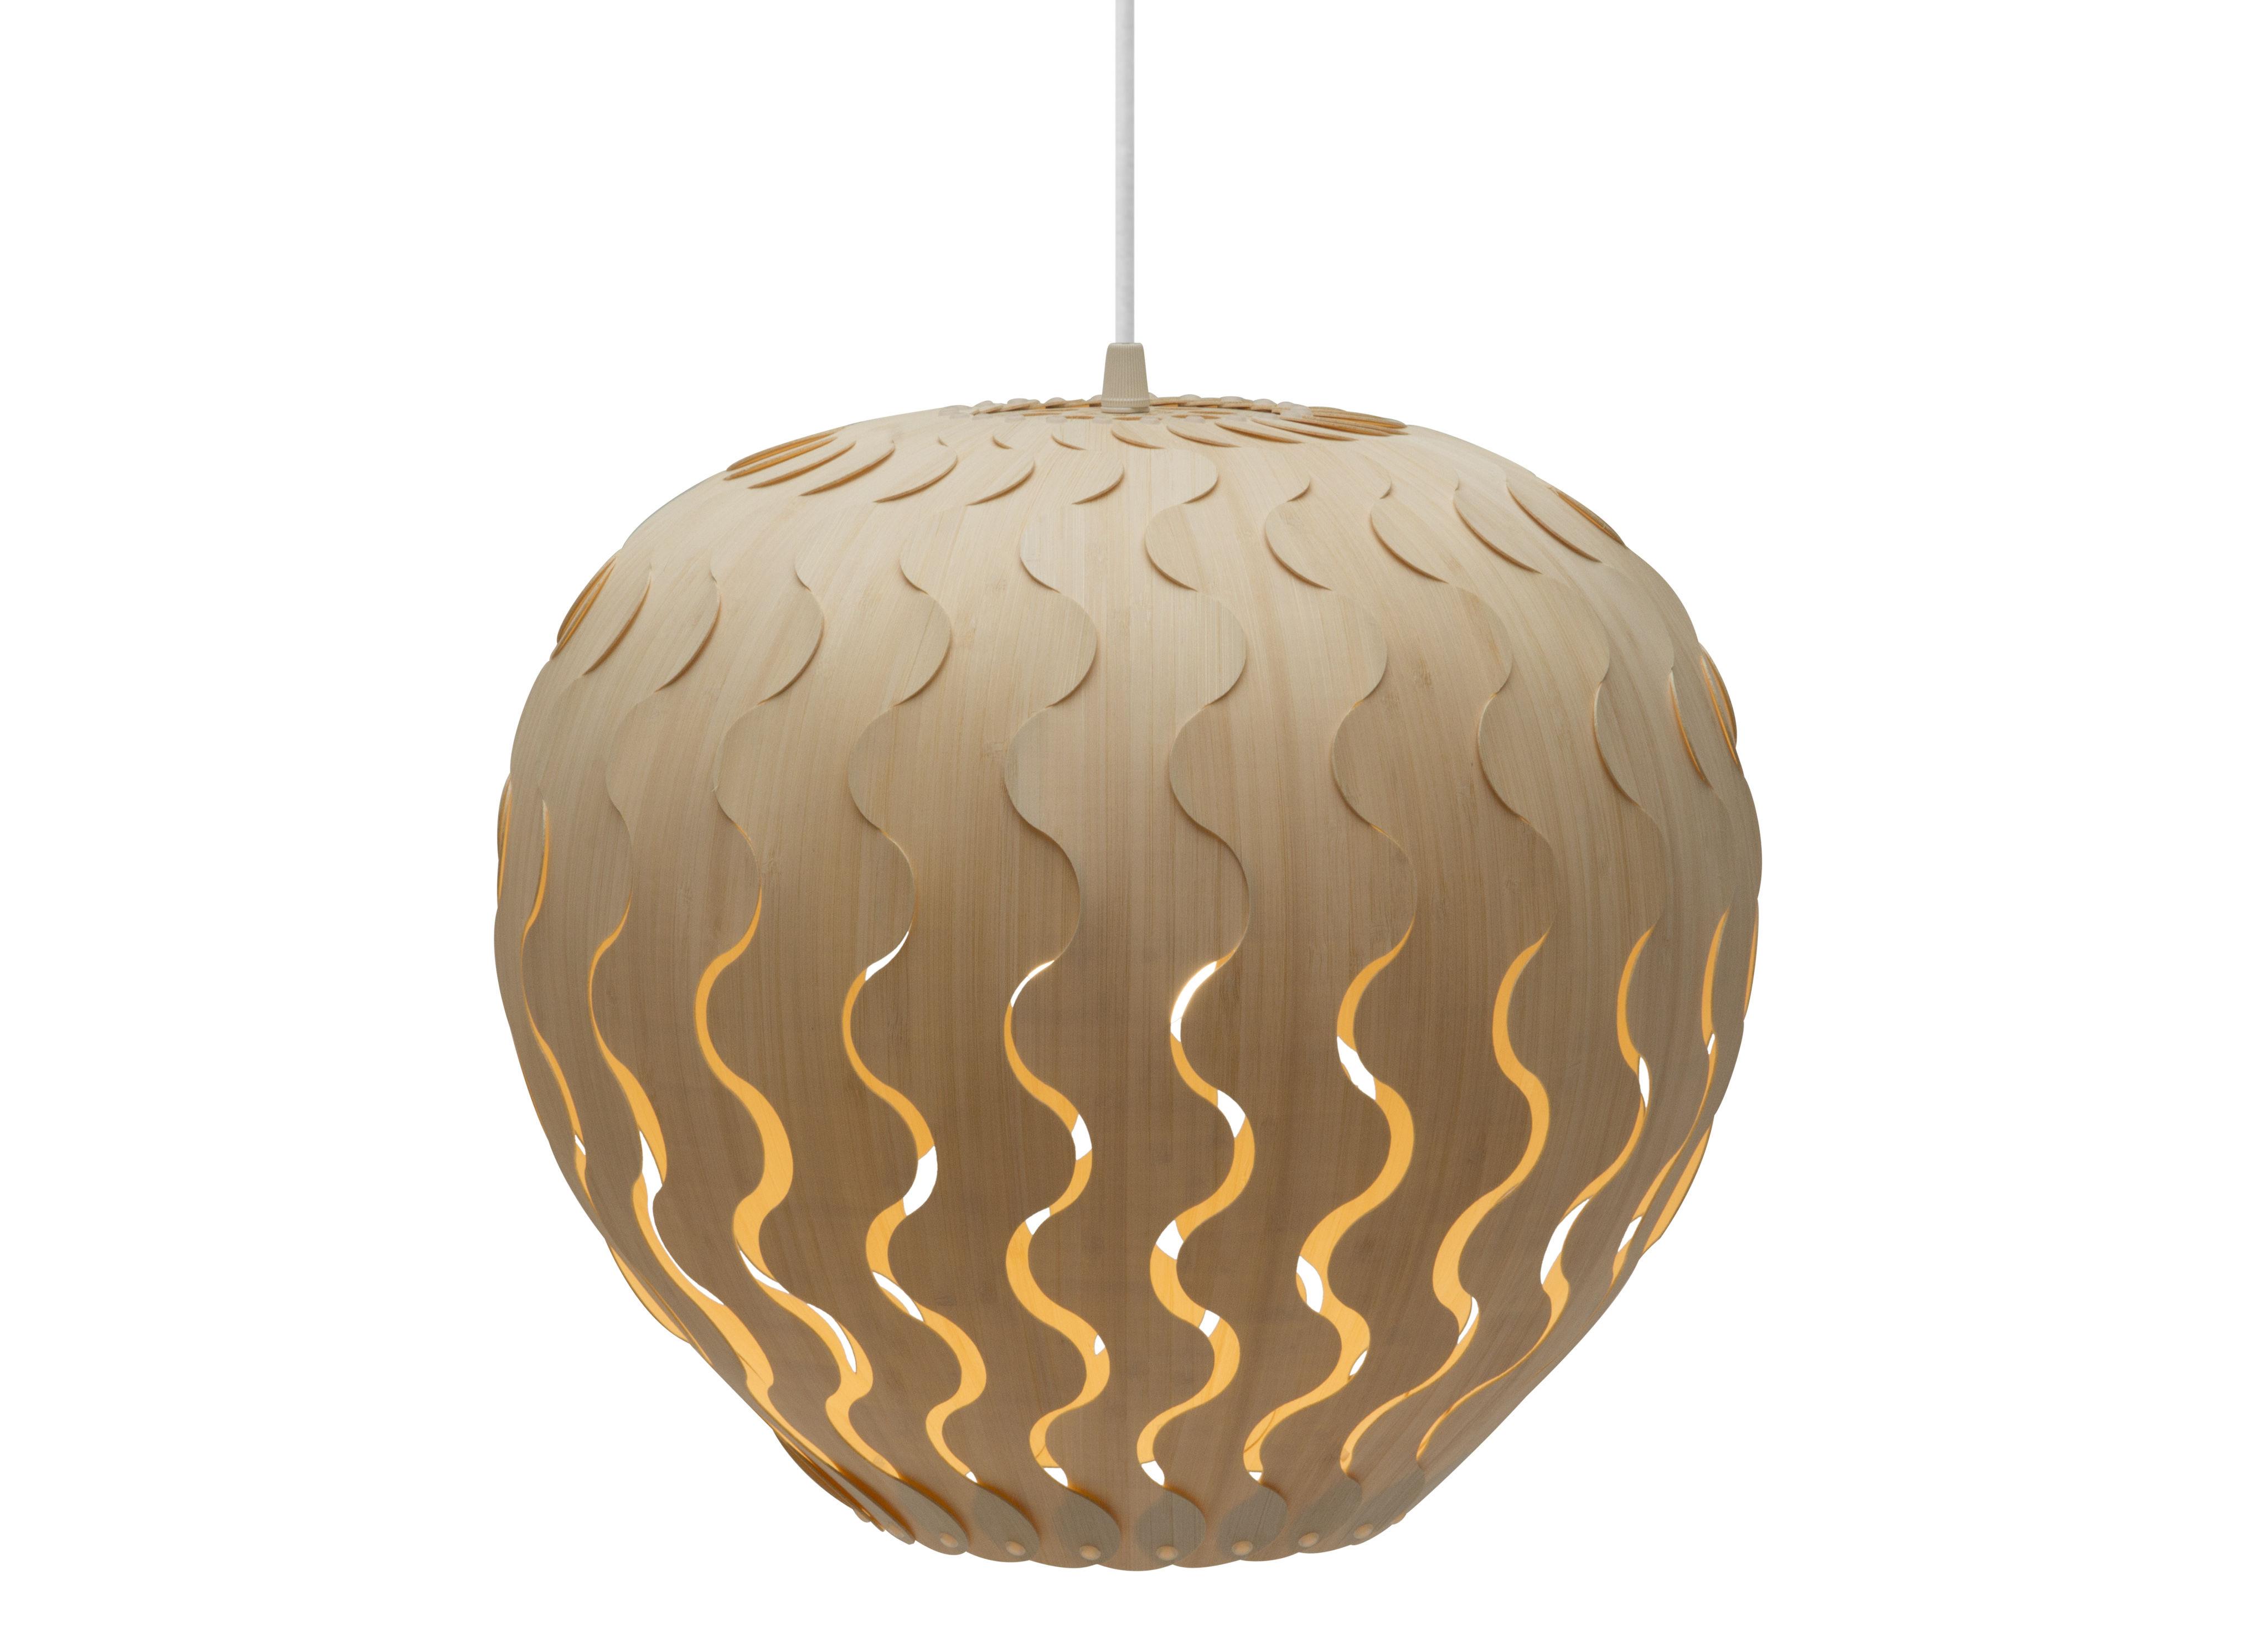 Lighting - Pendant Lighting - Belle Pendant - Small -  Ø 38 cm by David Trubridge - Small : Ø 38 cm - Bamboo, Nylon